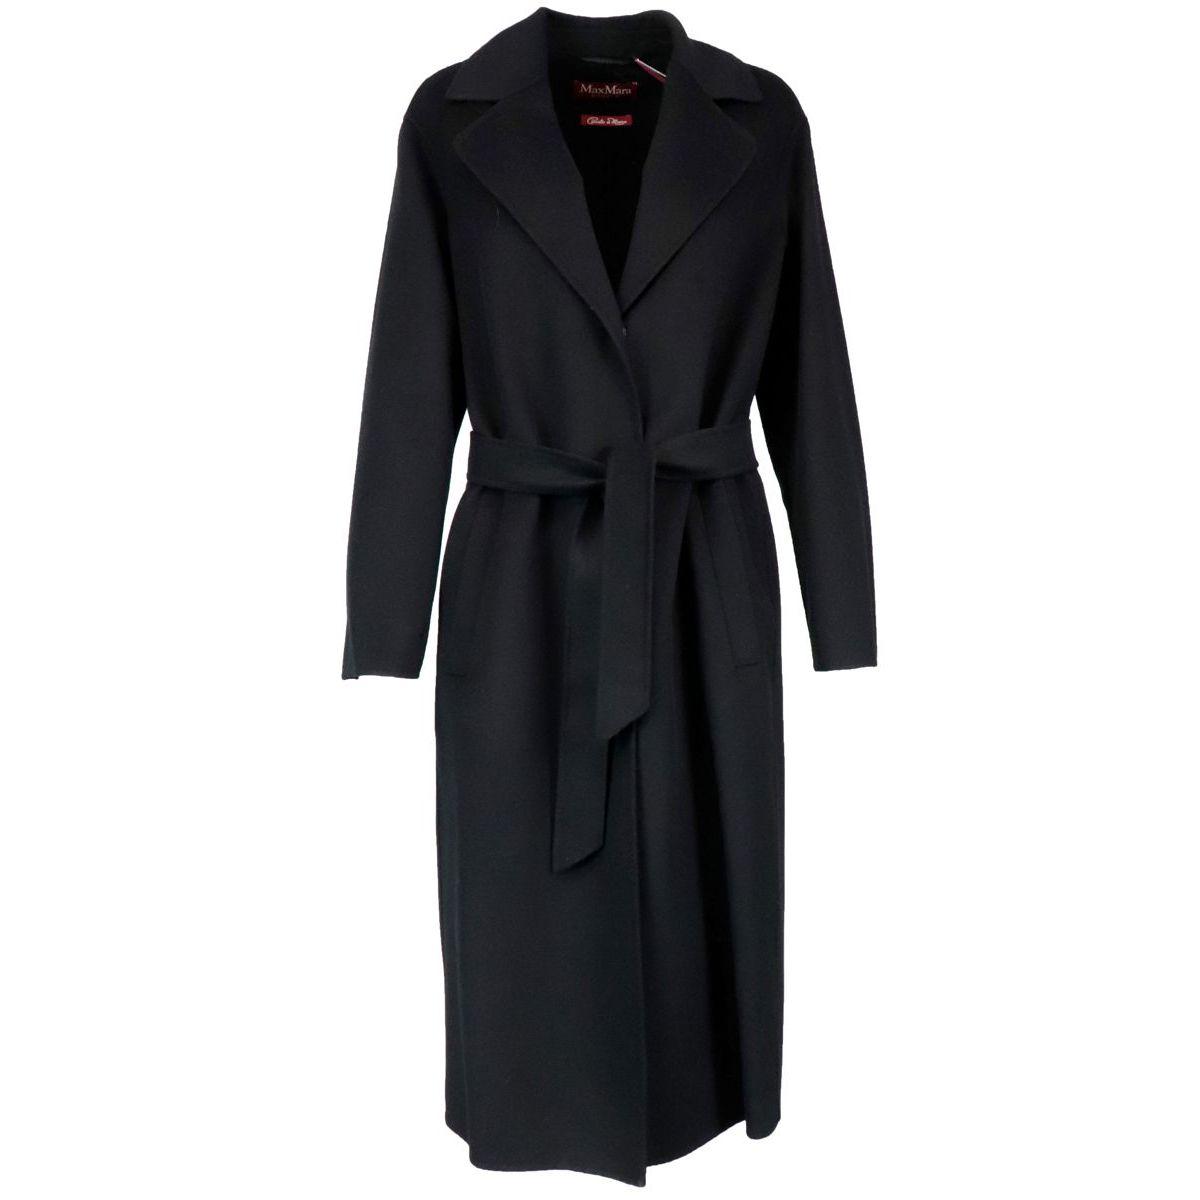 Belted Ermanna coat in wool blend Black MAX MARA STUDIO